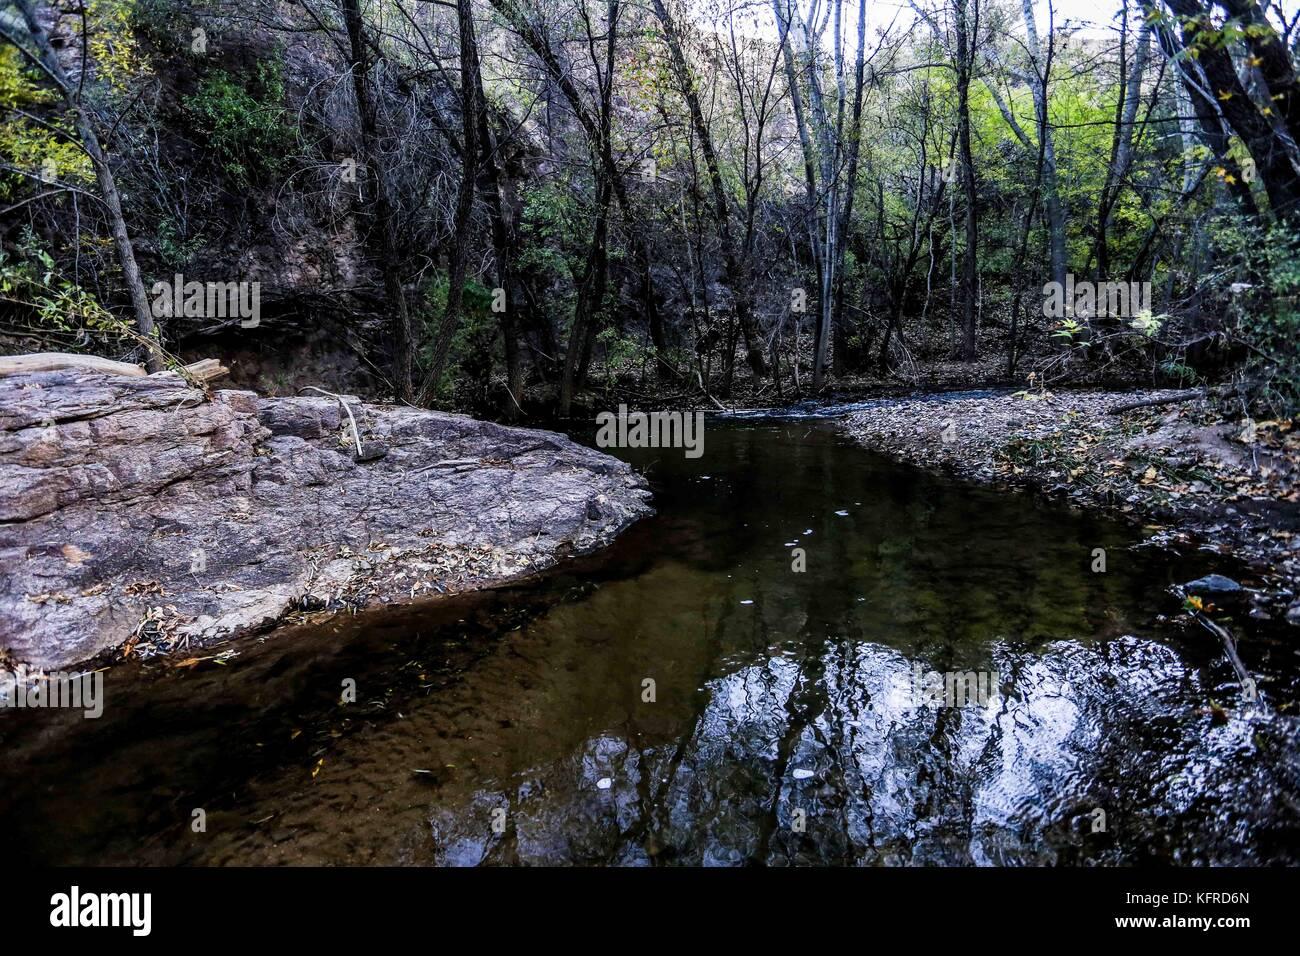 Les barrages de castors dans l'écosystème la Cuenca los ojos de Agua Prieta, Sonora, Mexique. Castor nada en dique. Banque D'Images